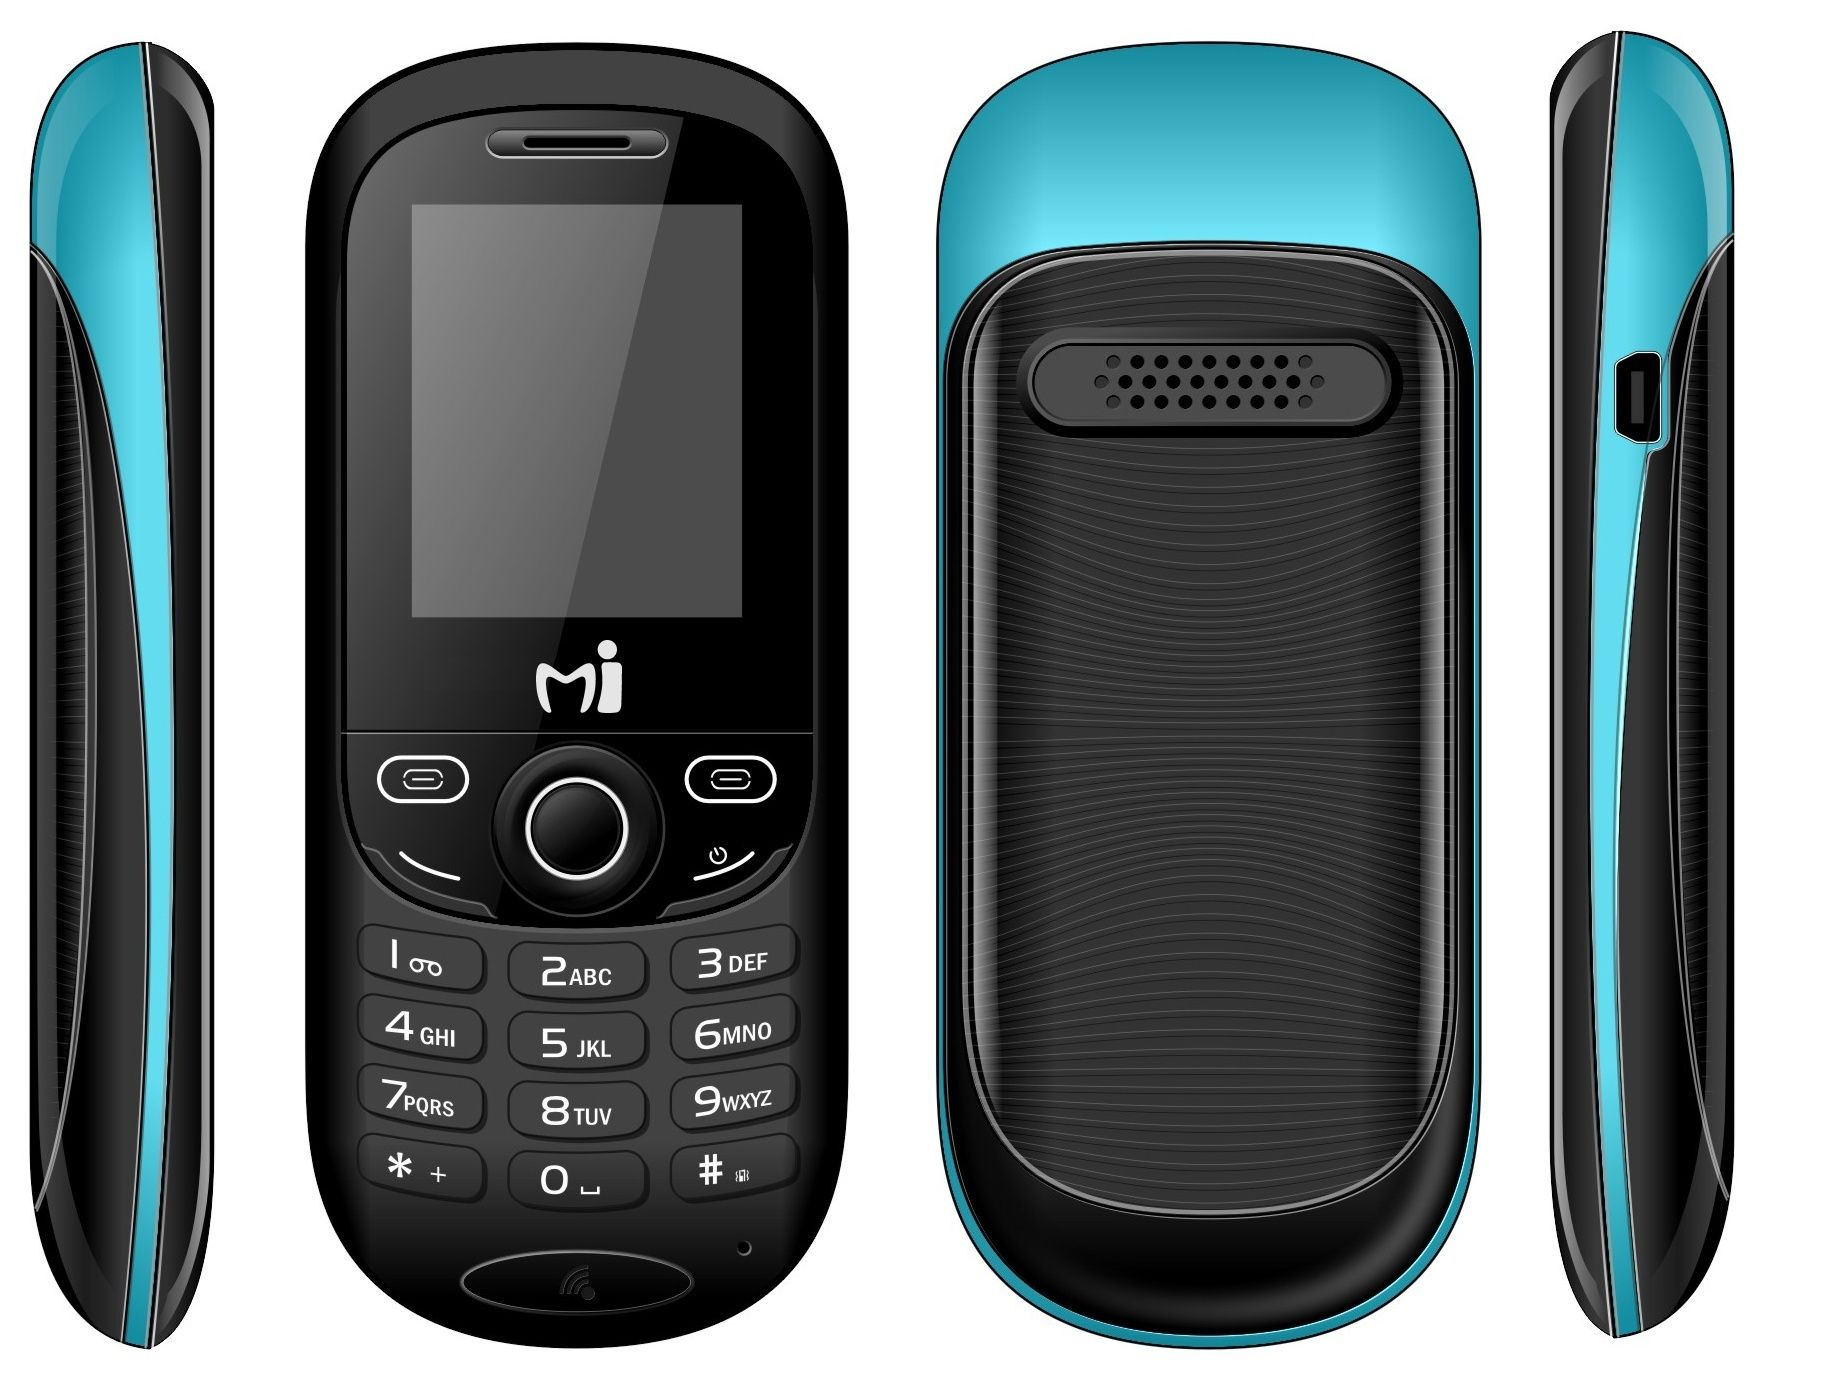 Mi209 low cost feature phone dual sim torch fm radio